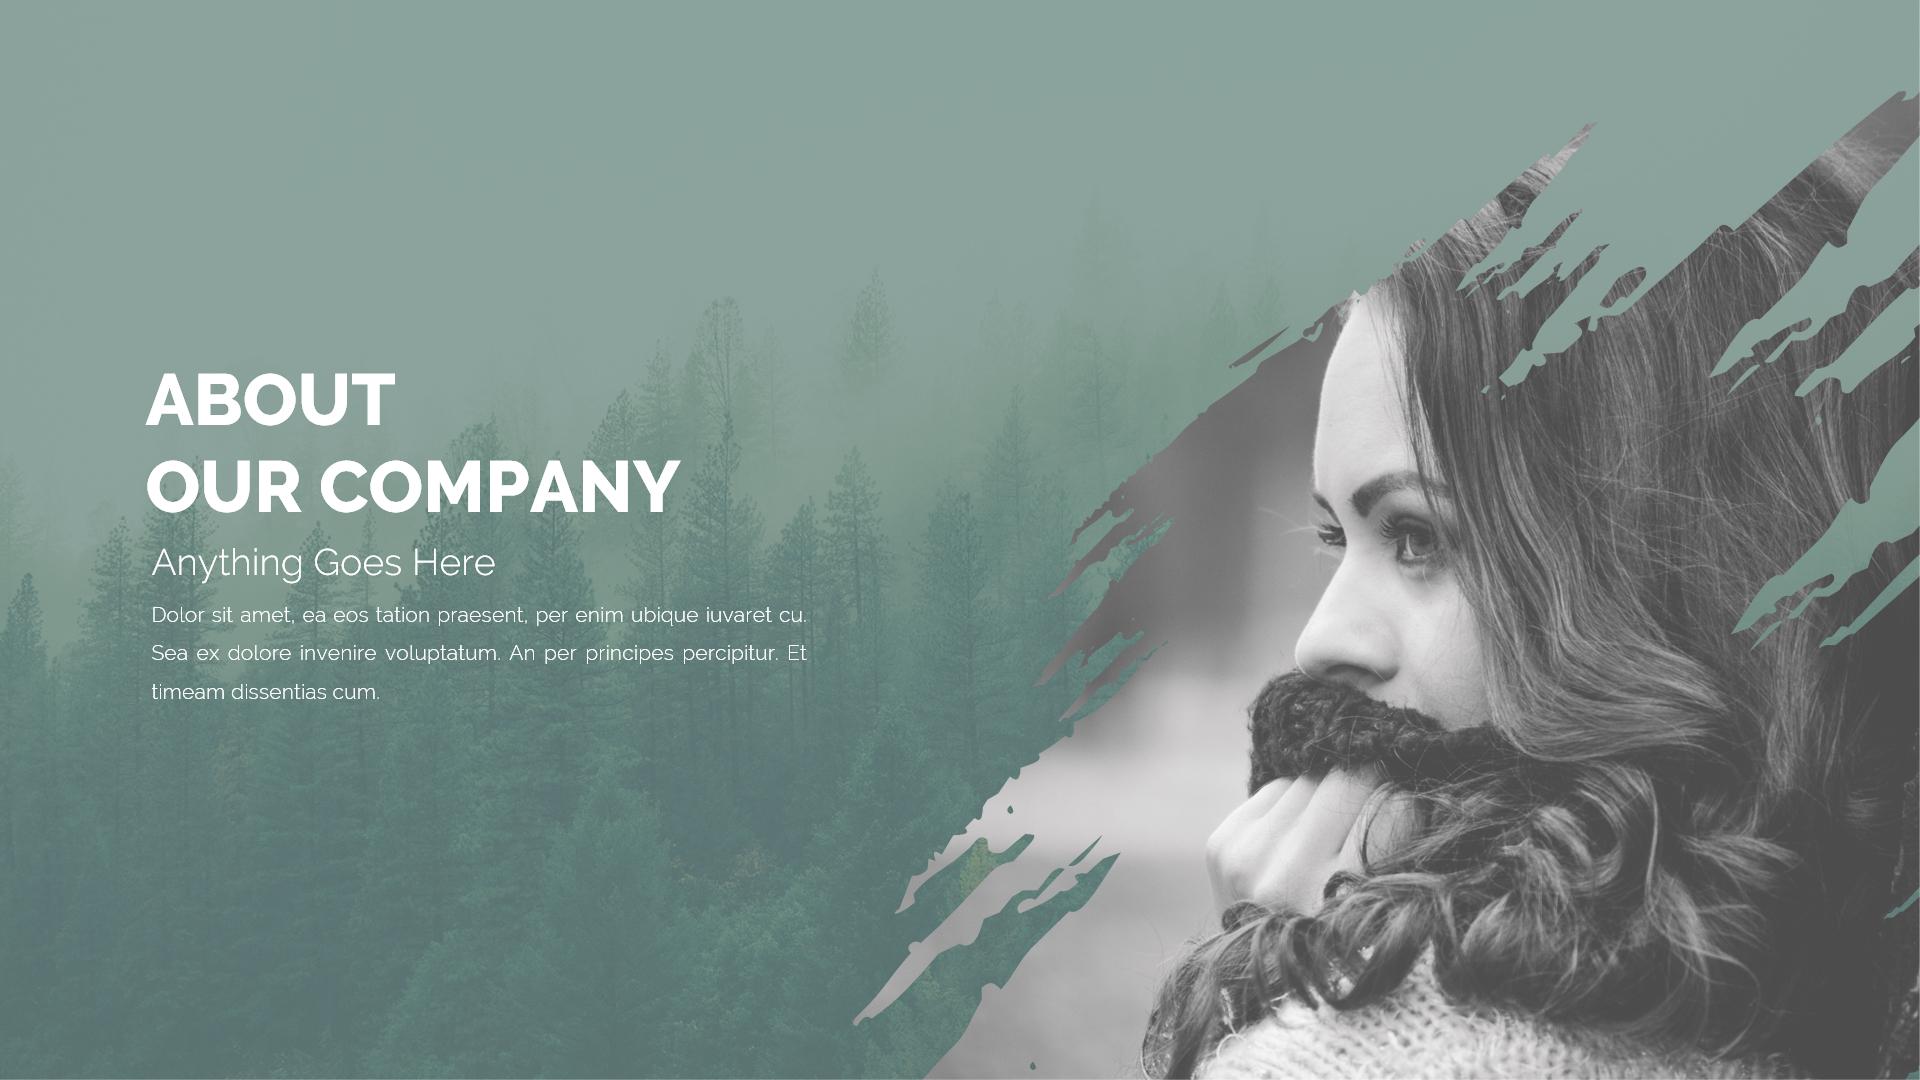 Inspired Multipurpose Google Slide Template by kuzenpower | GraphicRiver